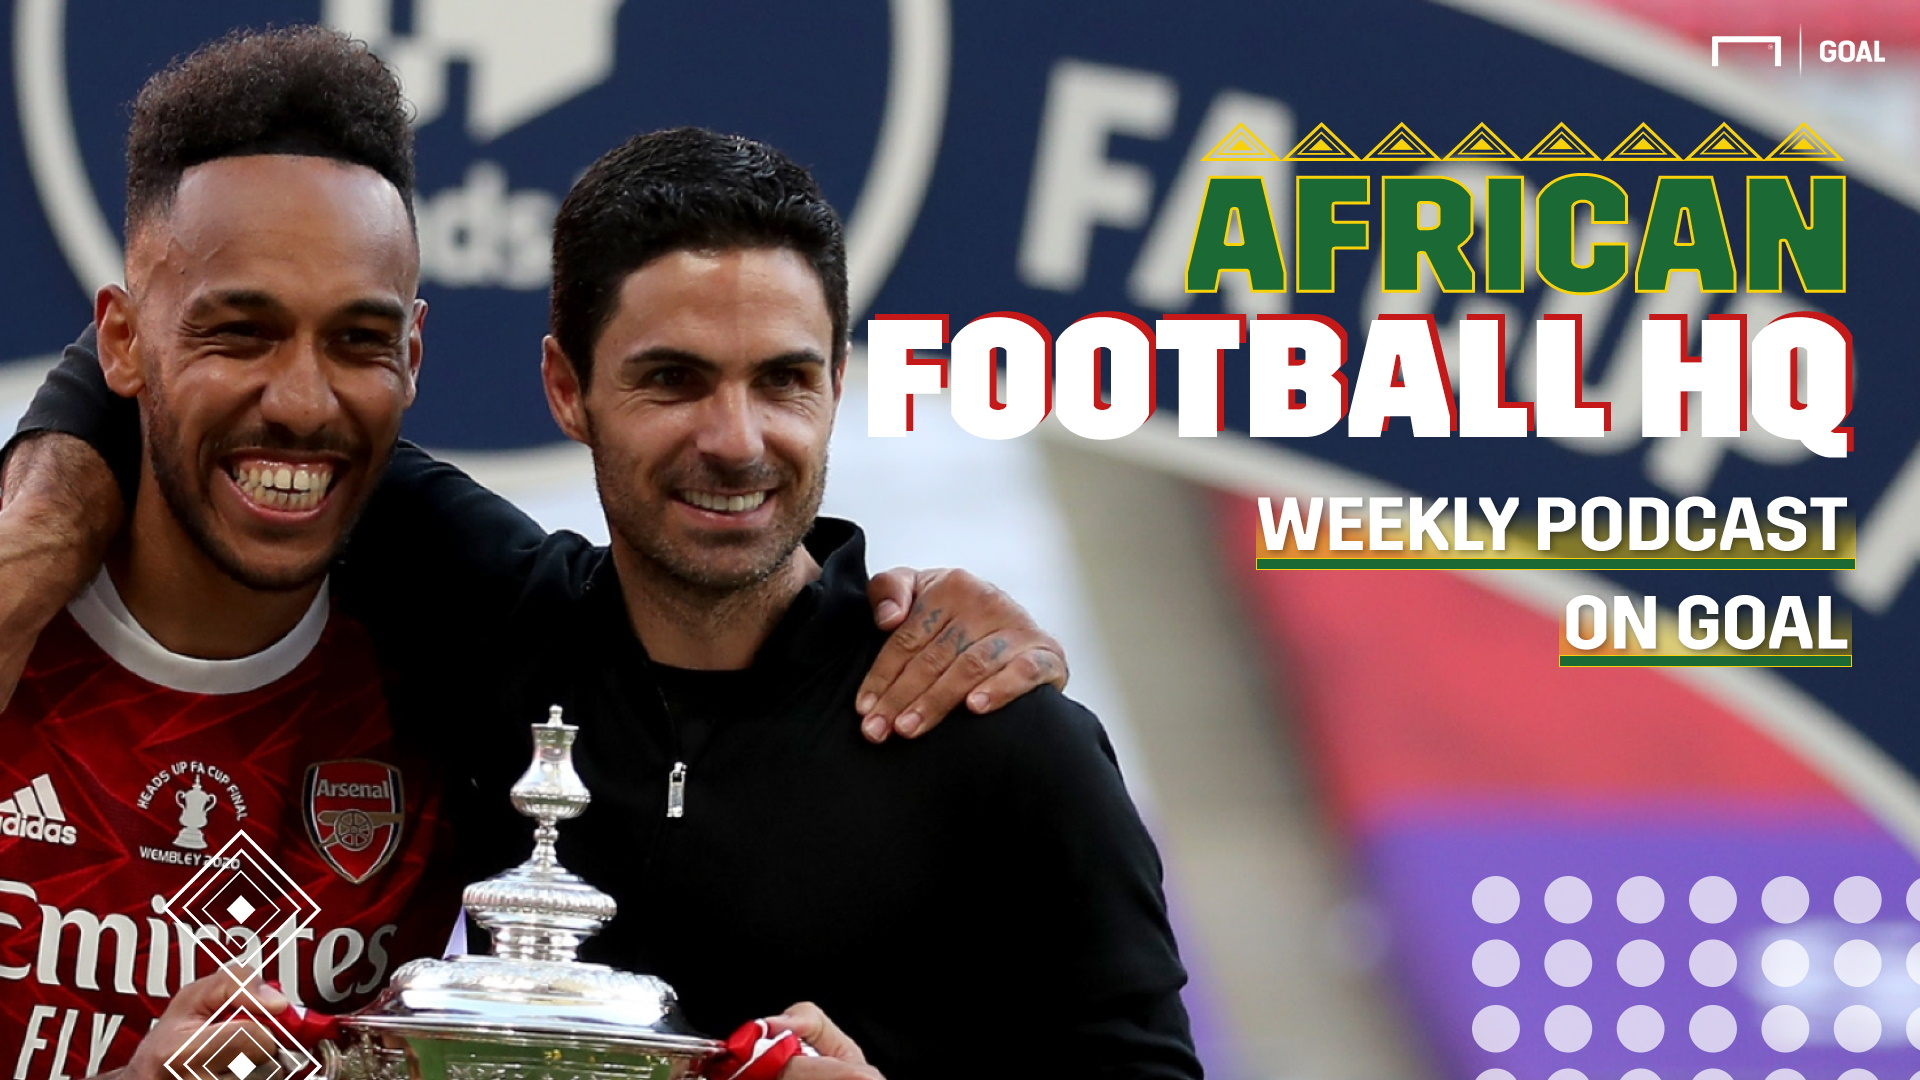 Andre Ayew to PSG, Aubameyang's heroics make history: African Football HQ